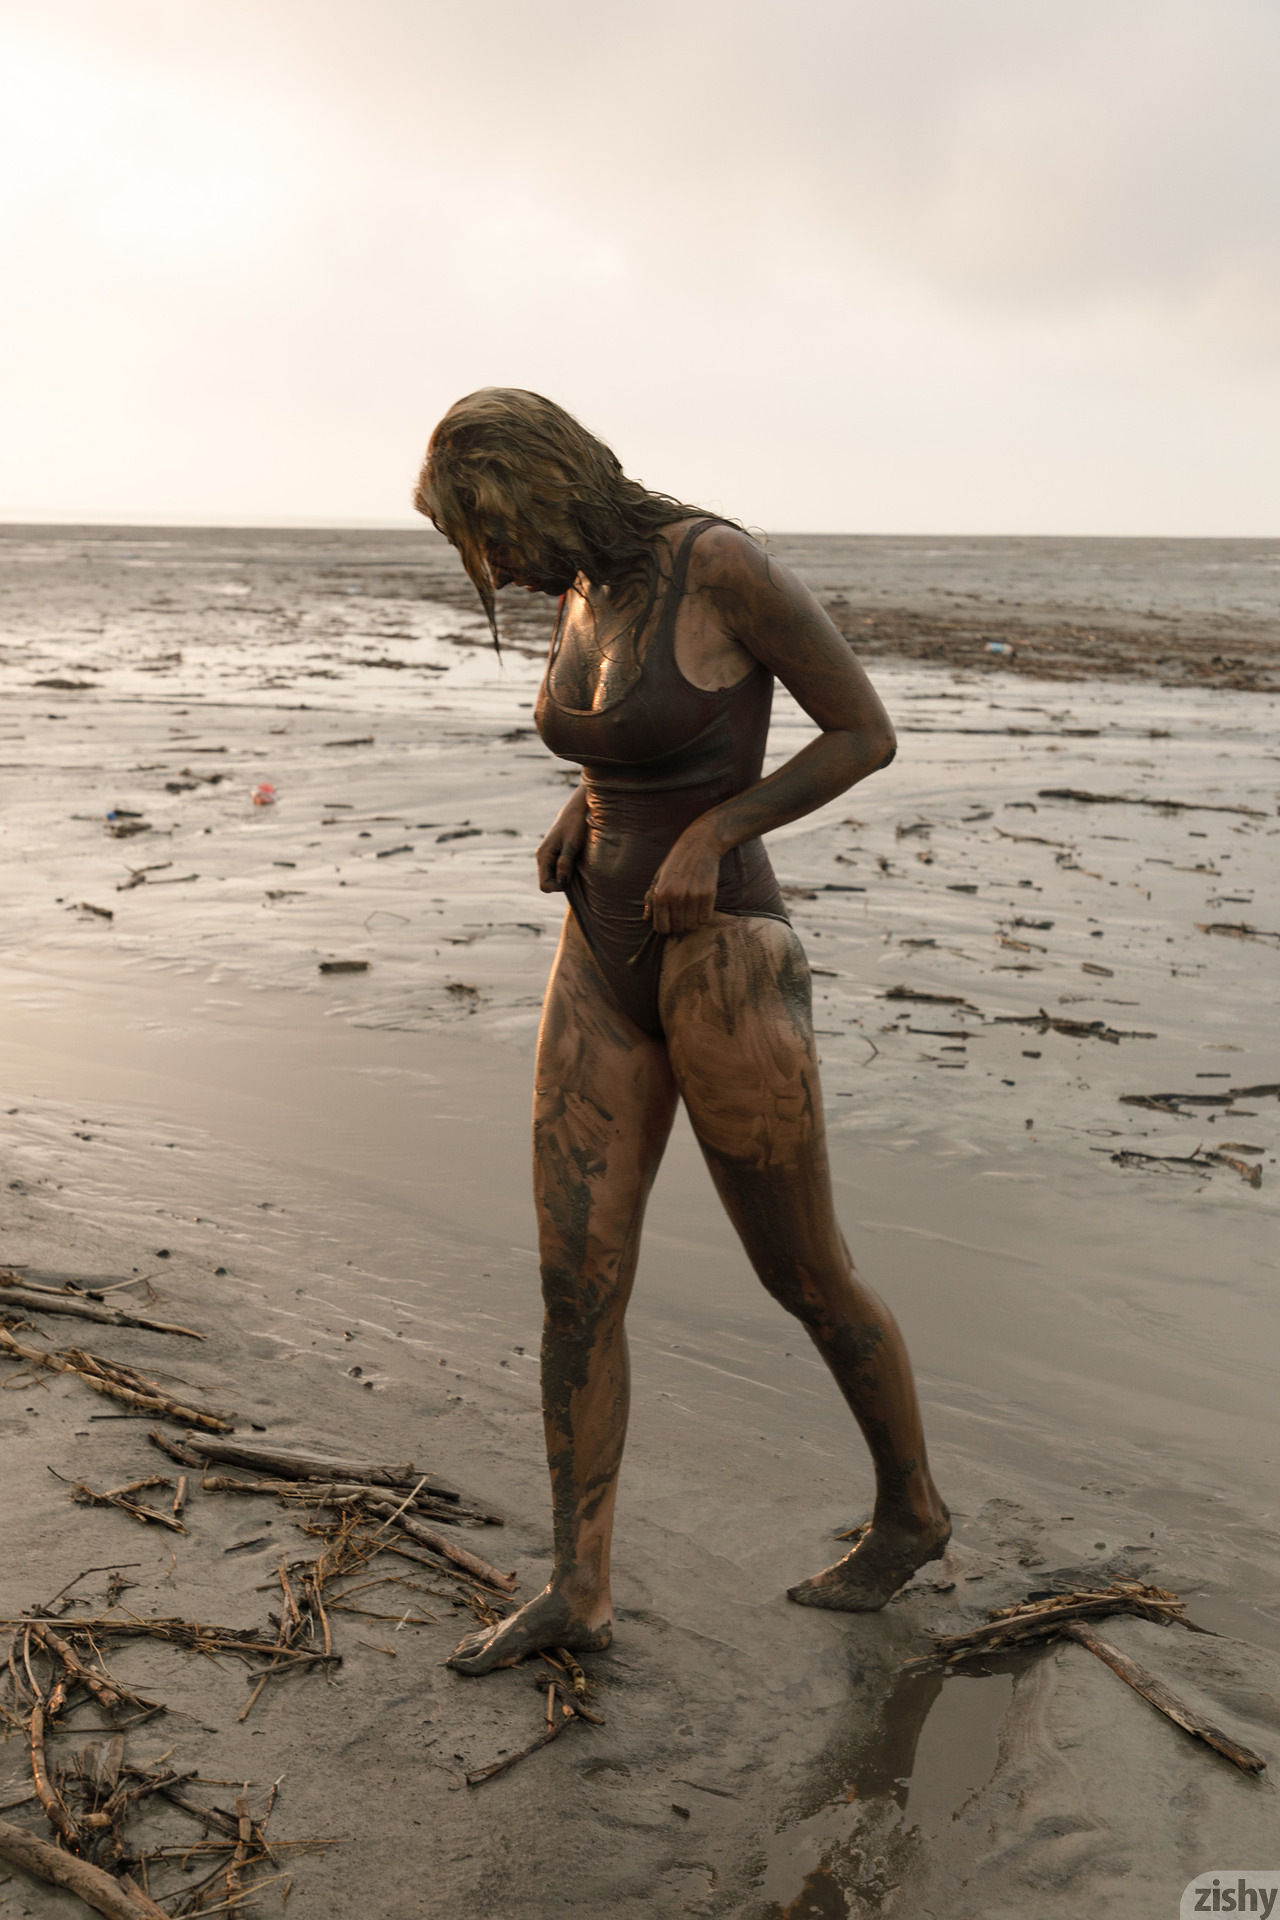 Sofia Orlova On Gryaznyy Beach Zishy (60)